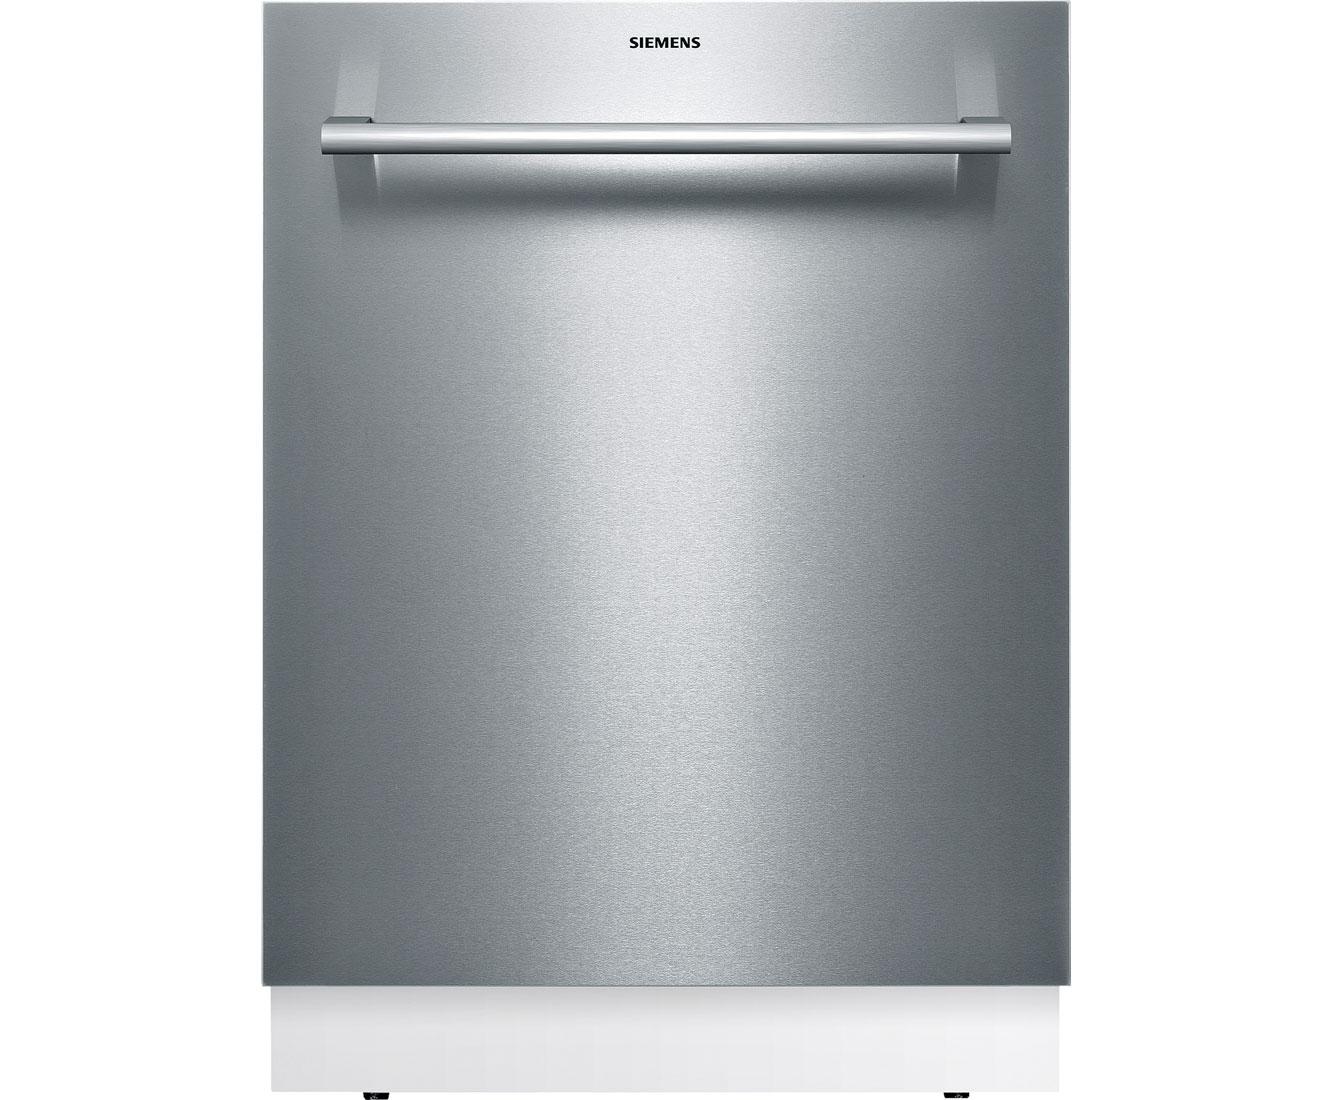 Siemens Kühlschrank Fehler E4 : Kühlschrank tiefe aeg santo tsx stand kühlschrank